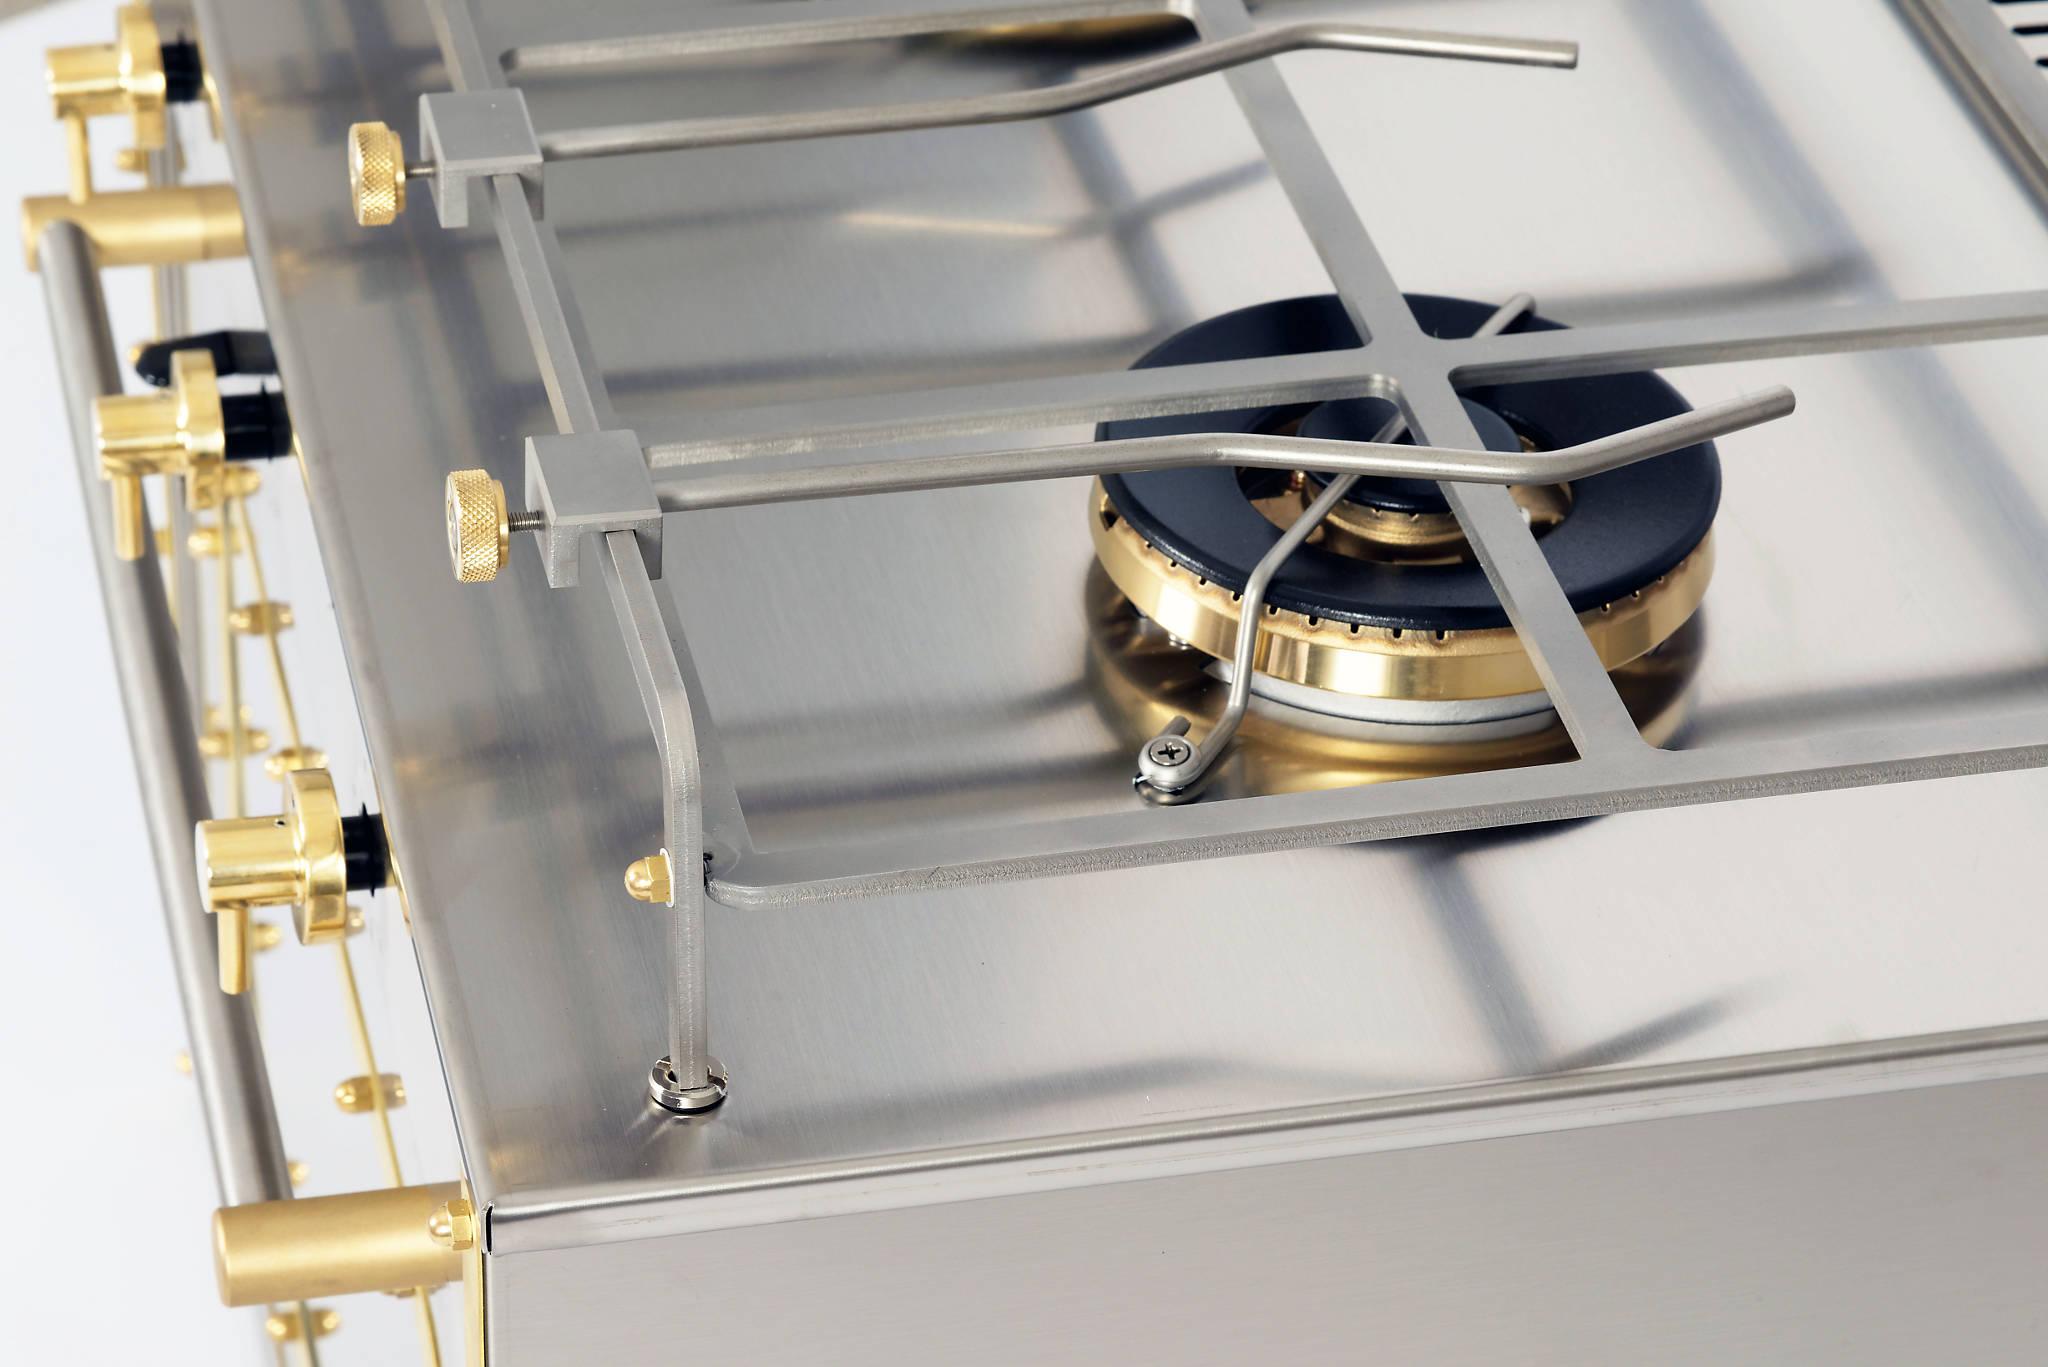 sailboat oven